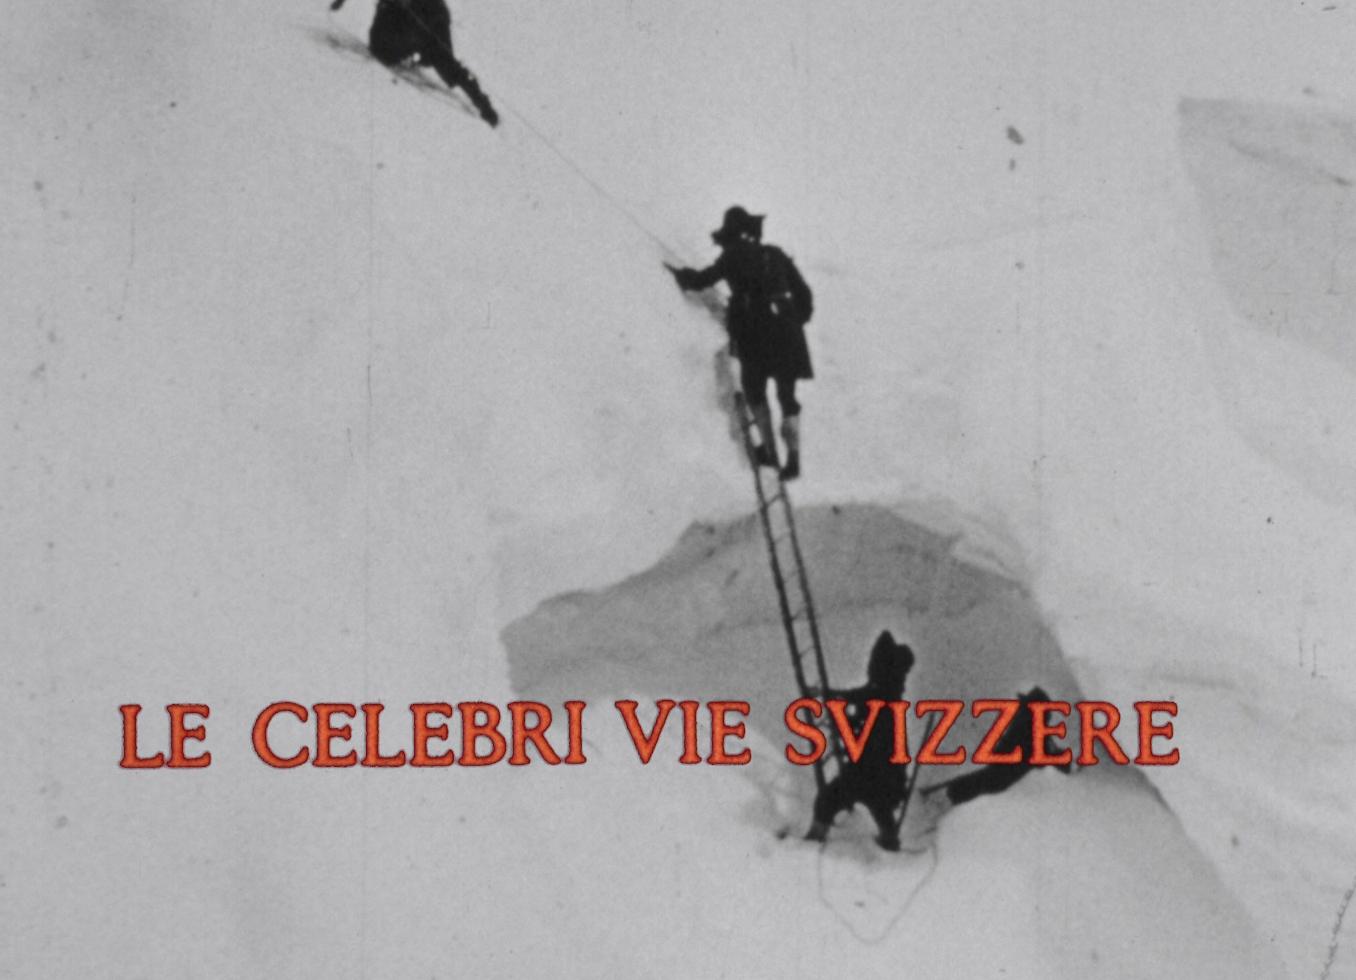 Le celebri vie svizzere: oltre i 4000 metri